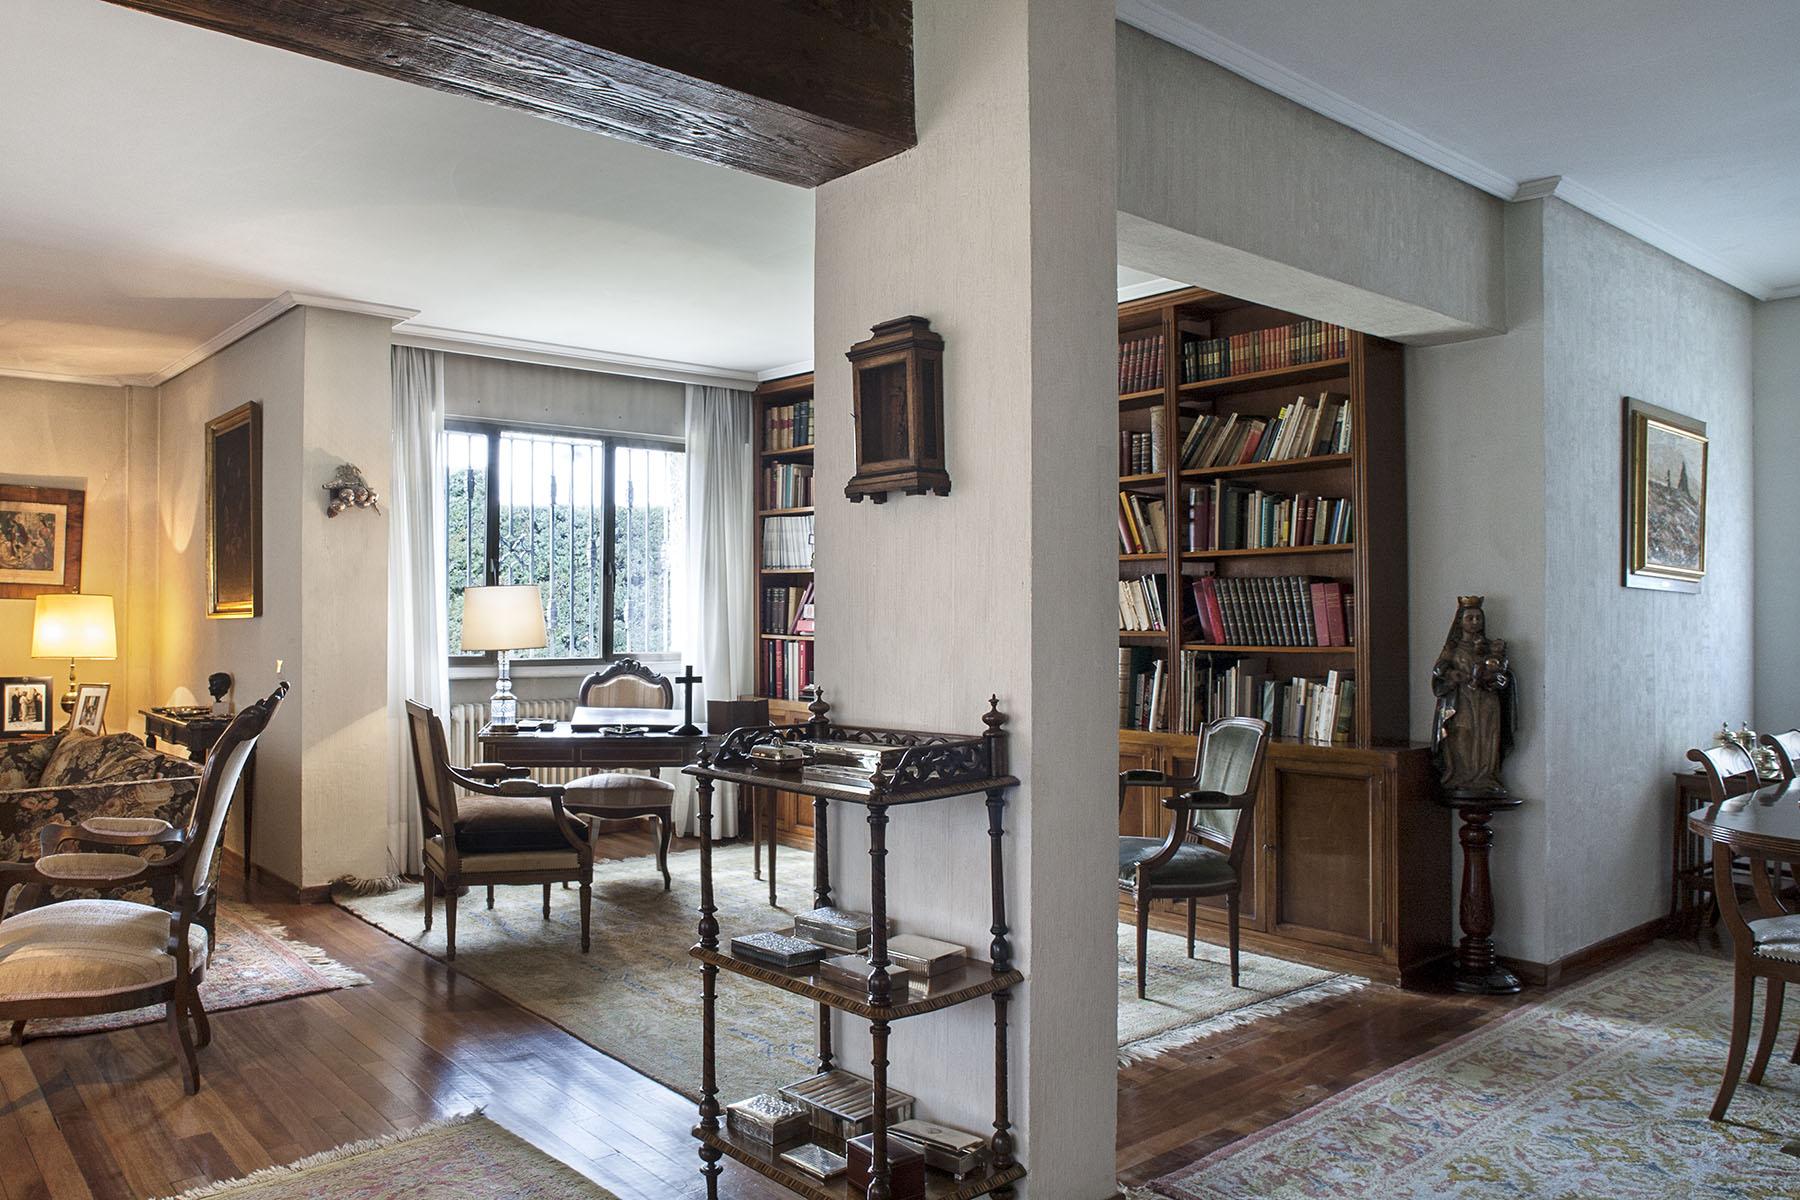 Single Family Home for Sale at magnifica propiedad en Pozuelo Madrid, Madrid, Spain